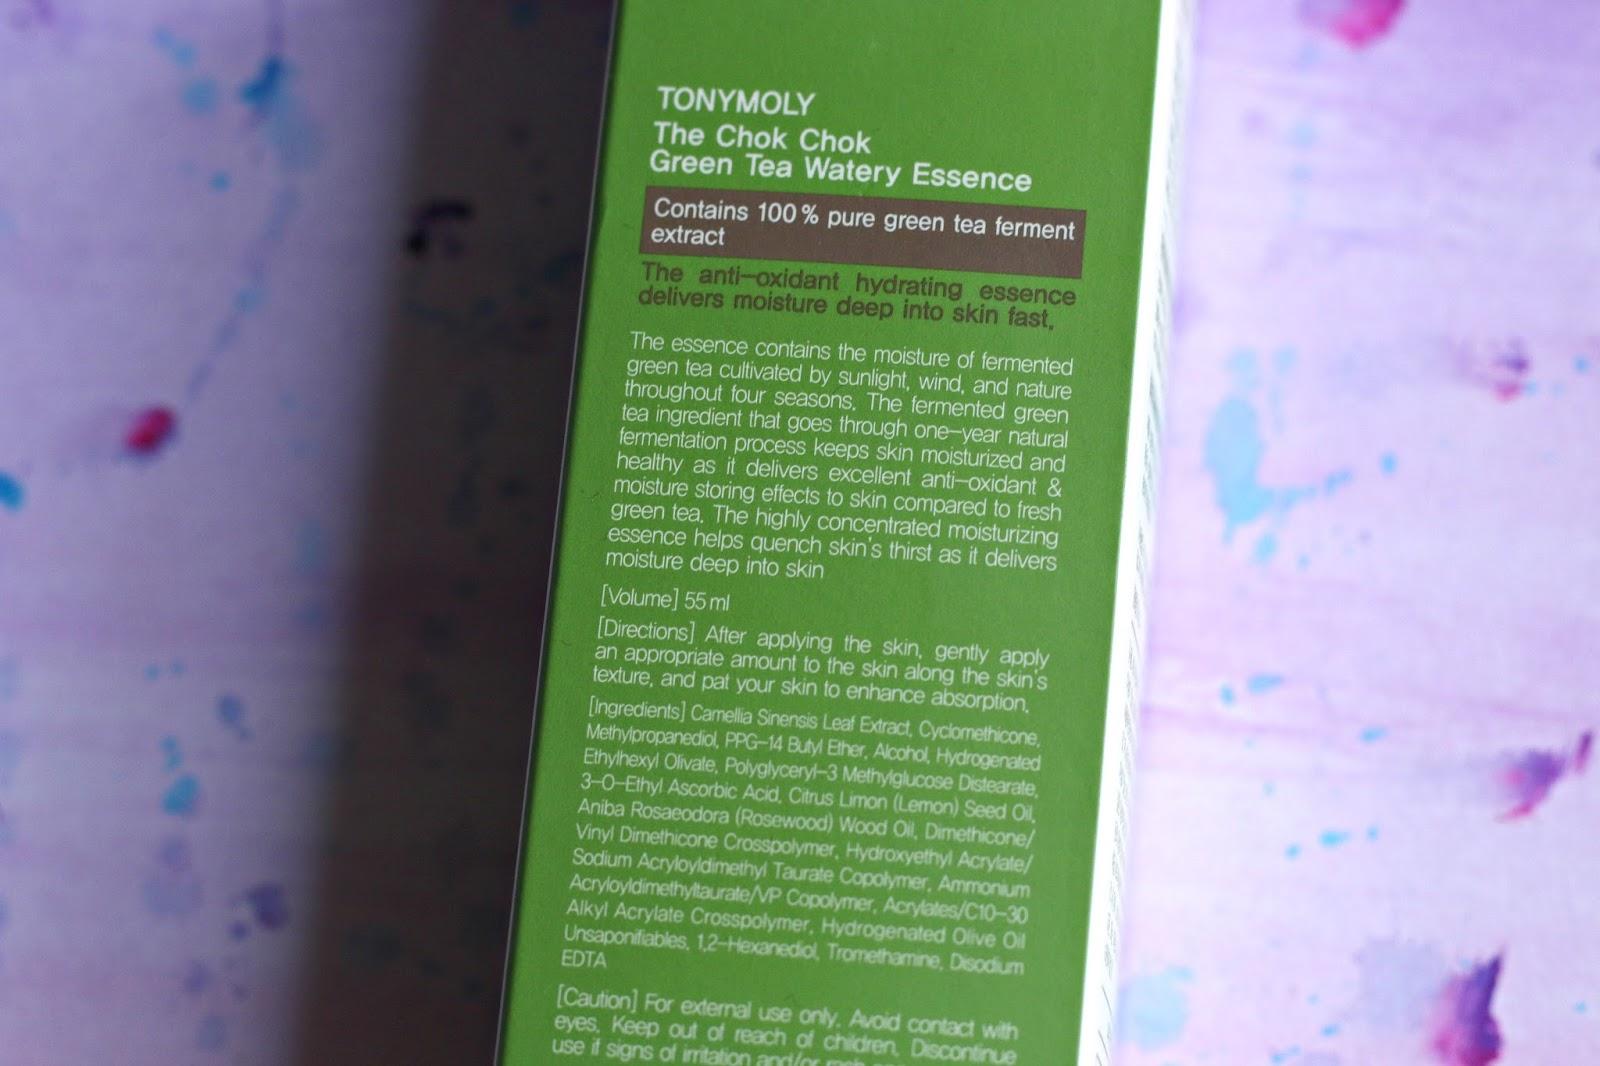 The Chok Chok Green Tea Watery Essence by TONYMOLY #22